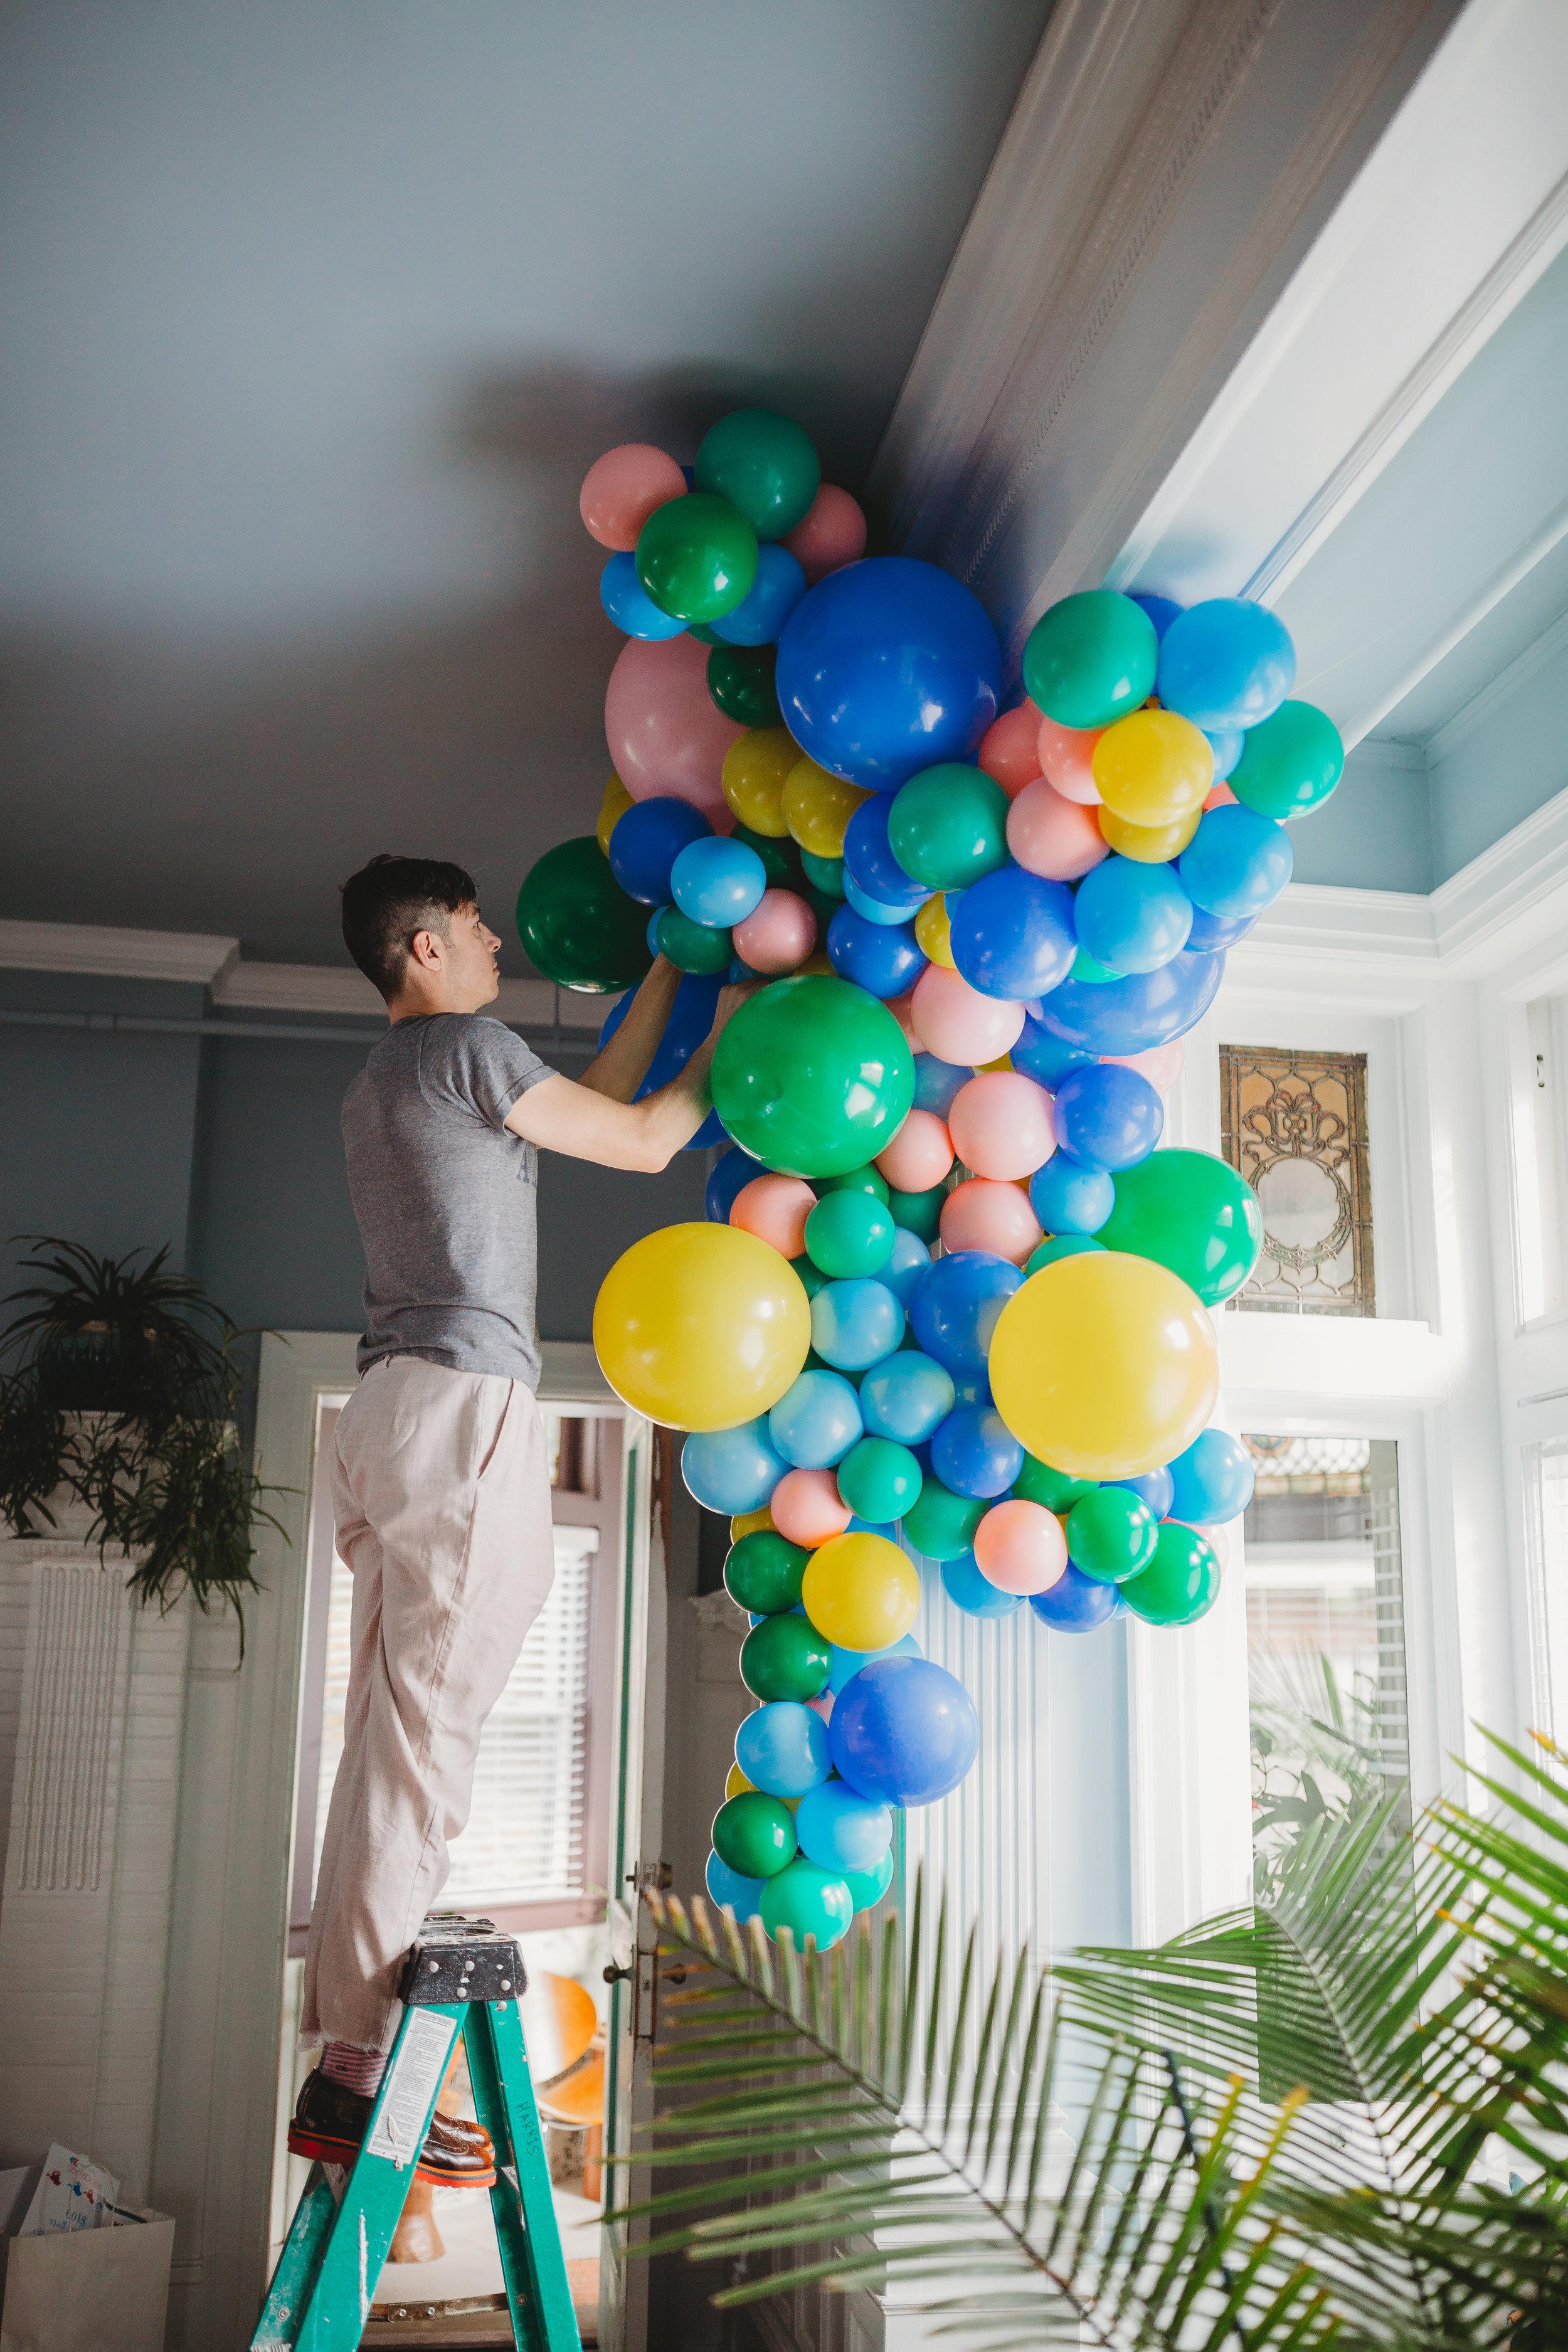 funk_balloon_about.jpg